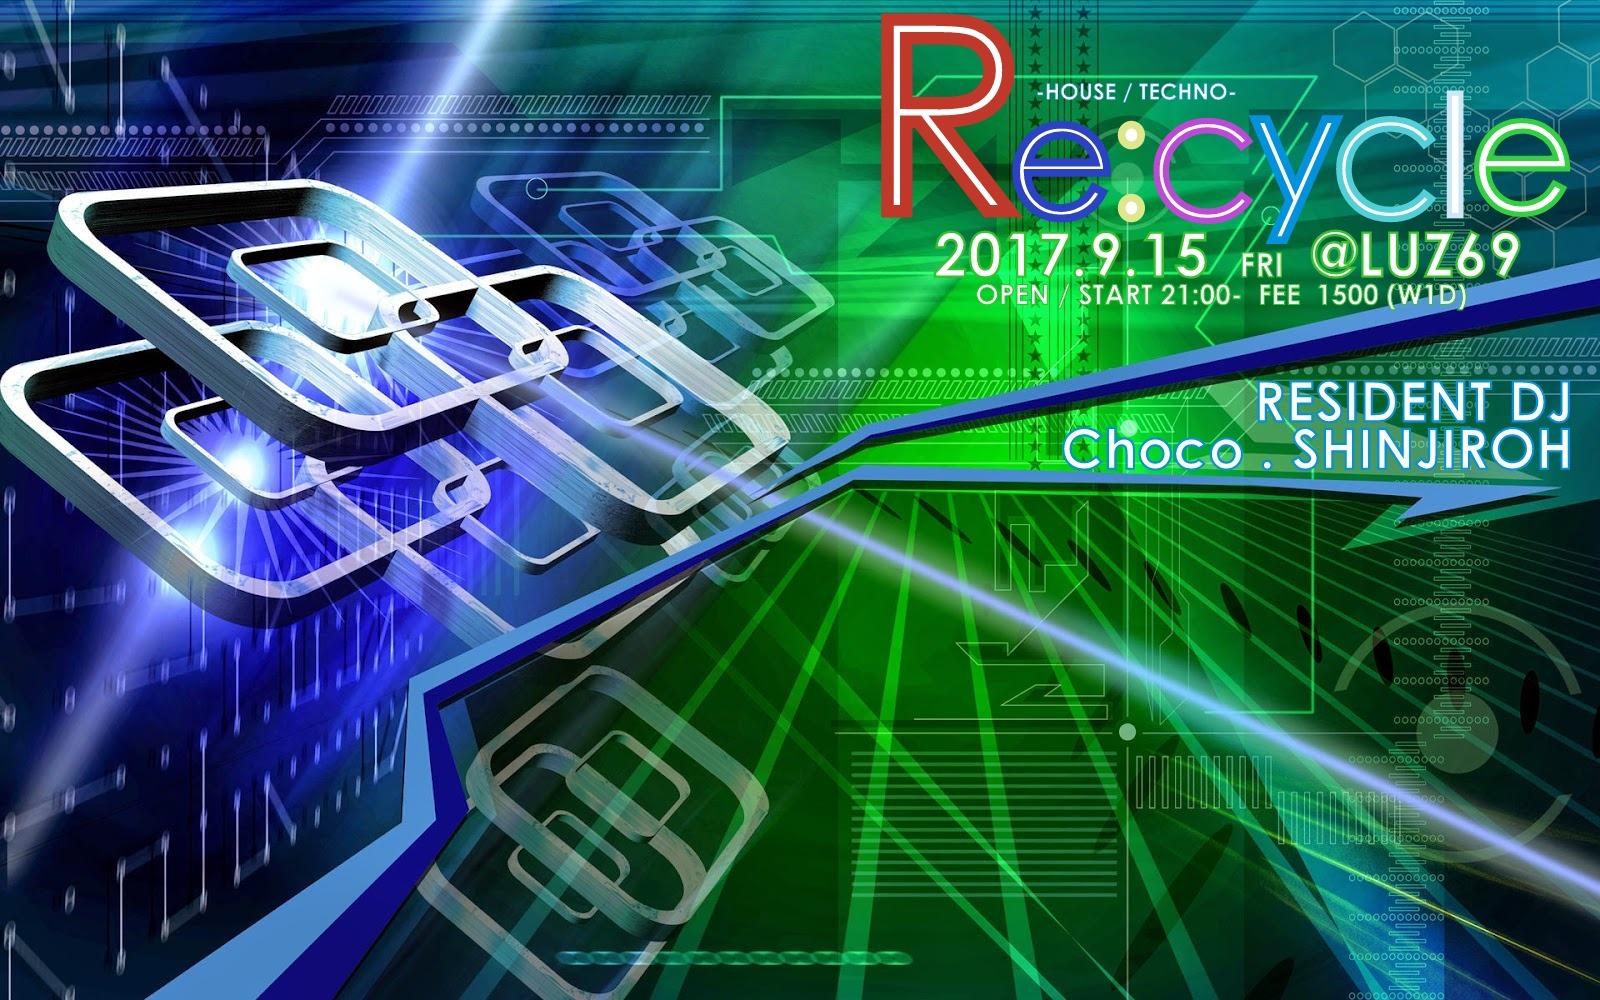 Re:cycle vol.8 (2k17.9.15 @LUZ69)_e0115904_23104580.jpg